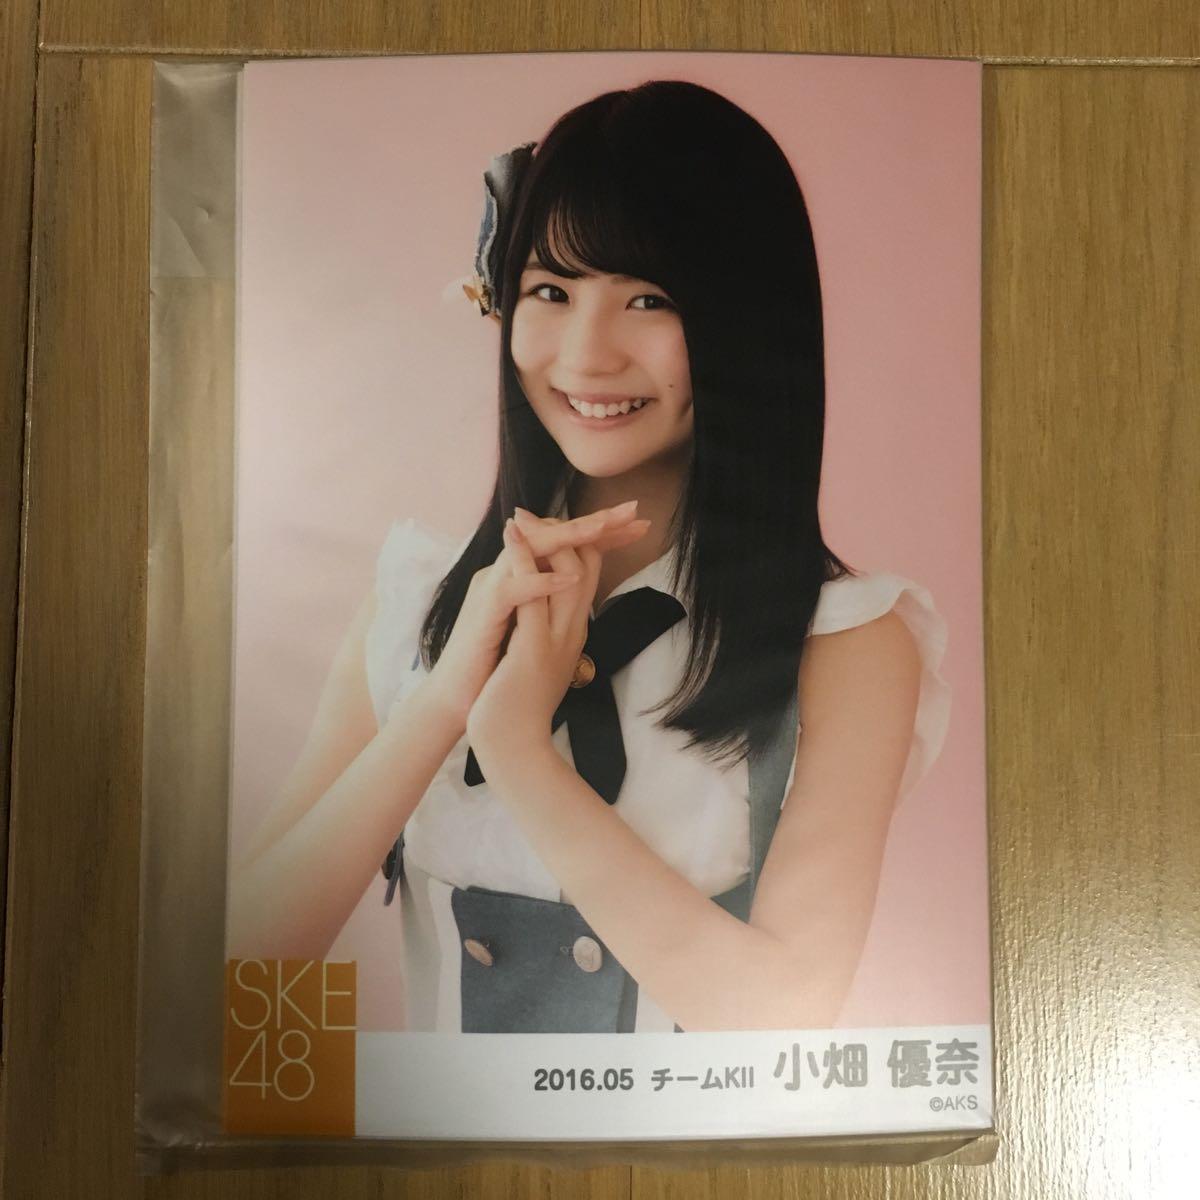 SKE48 小畑優奈 生写真 2016.5 5枚コンプ(未開封)